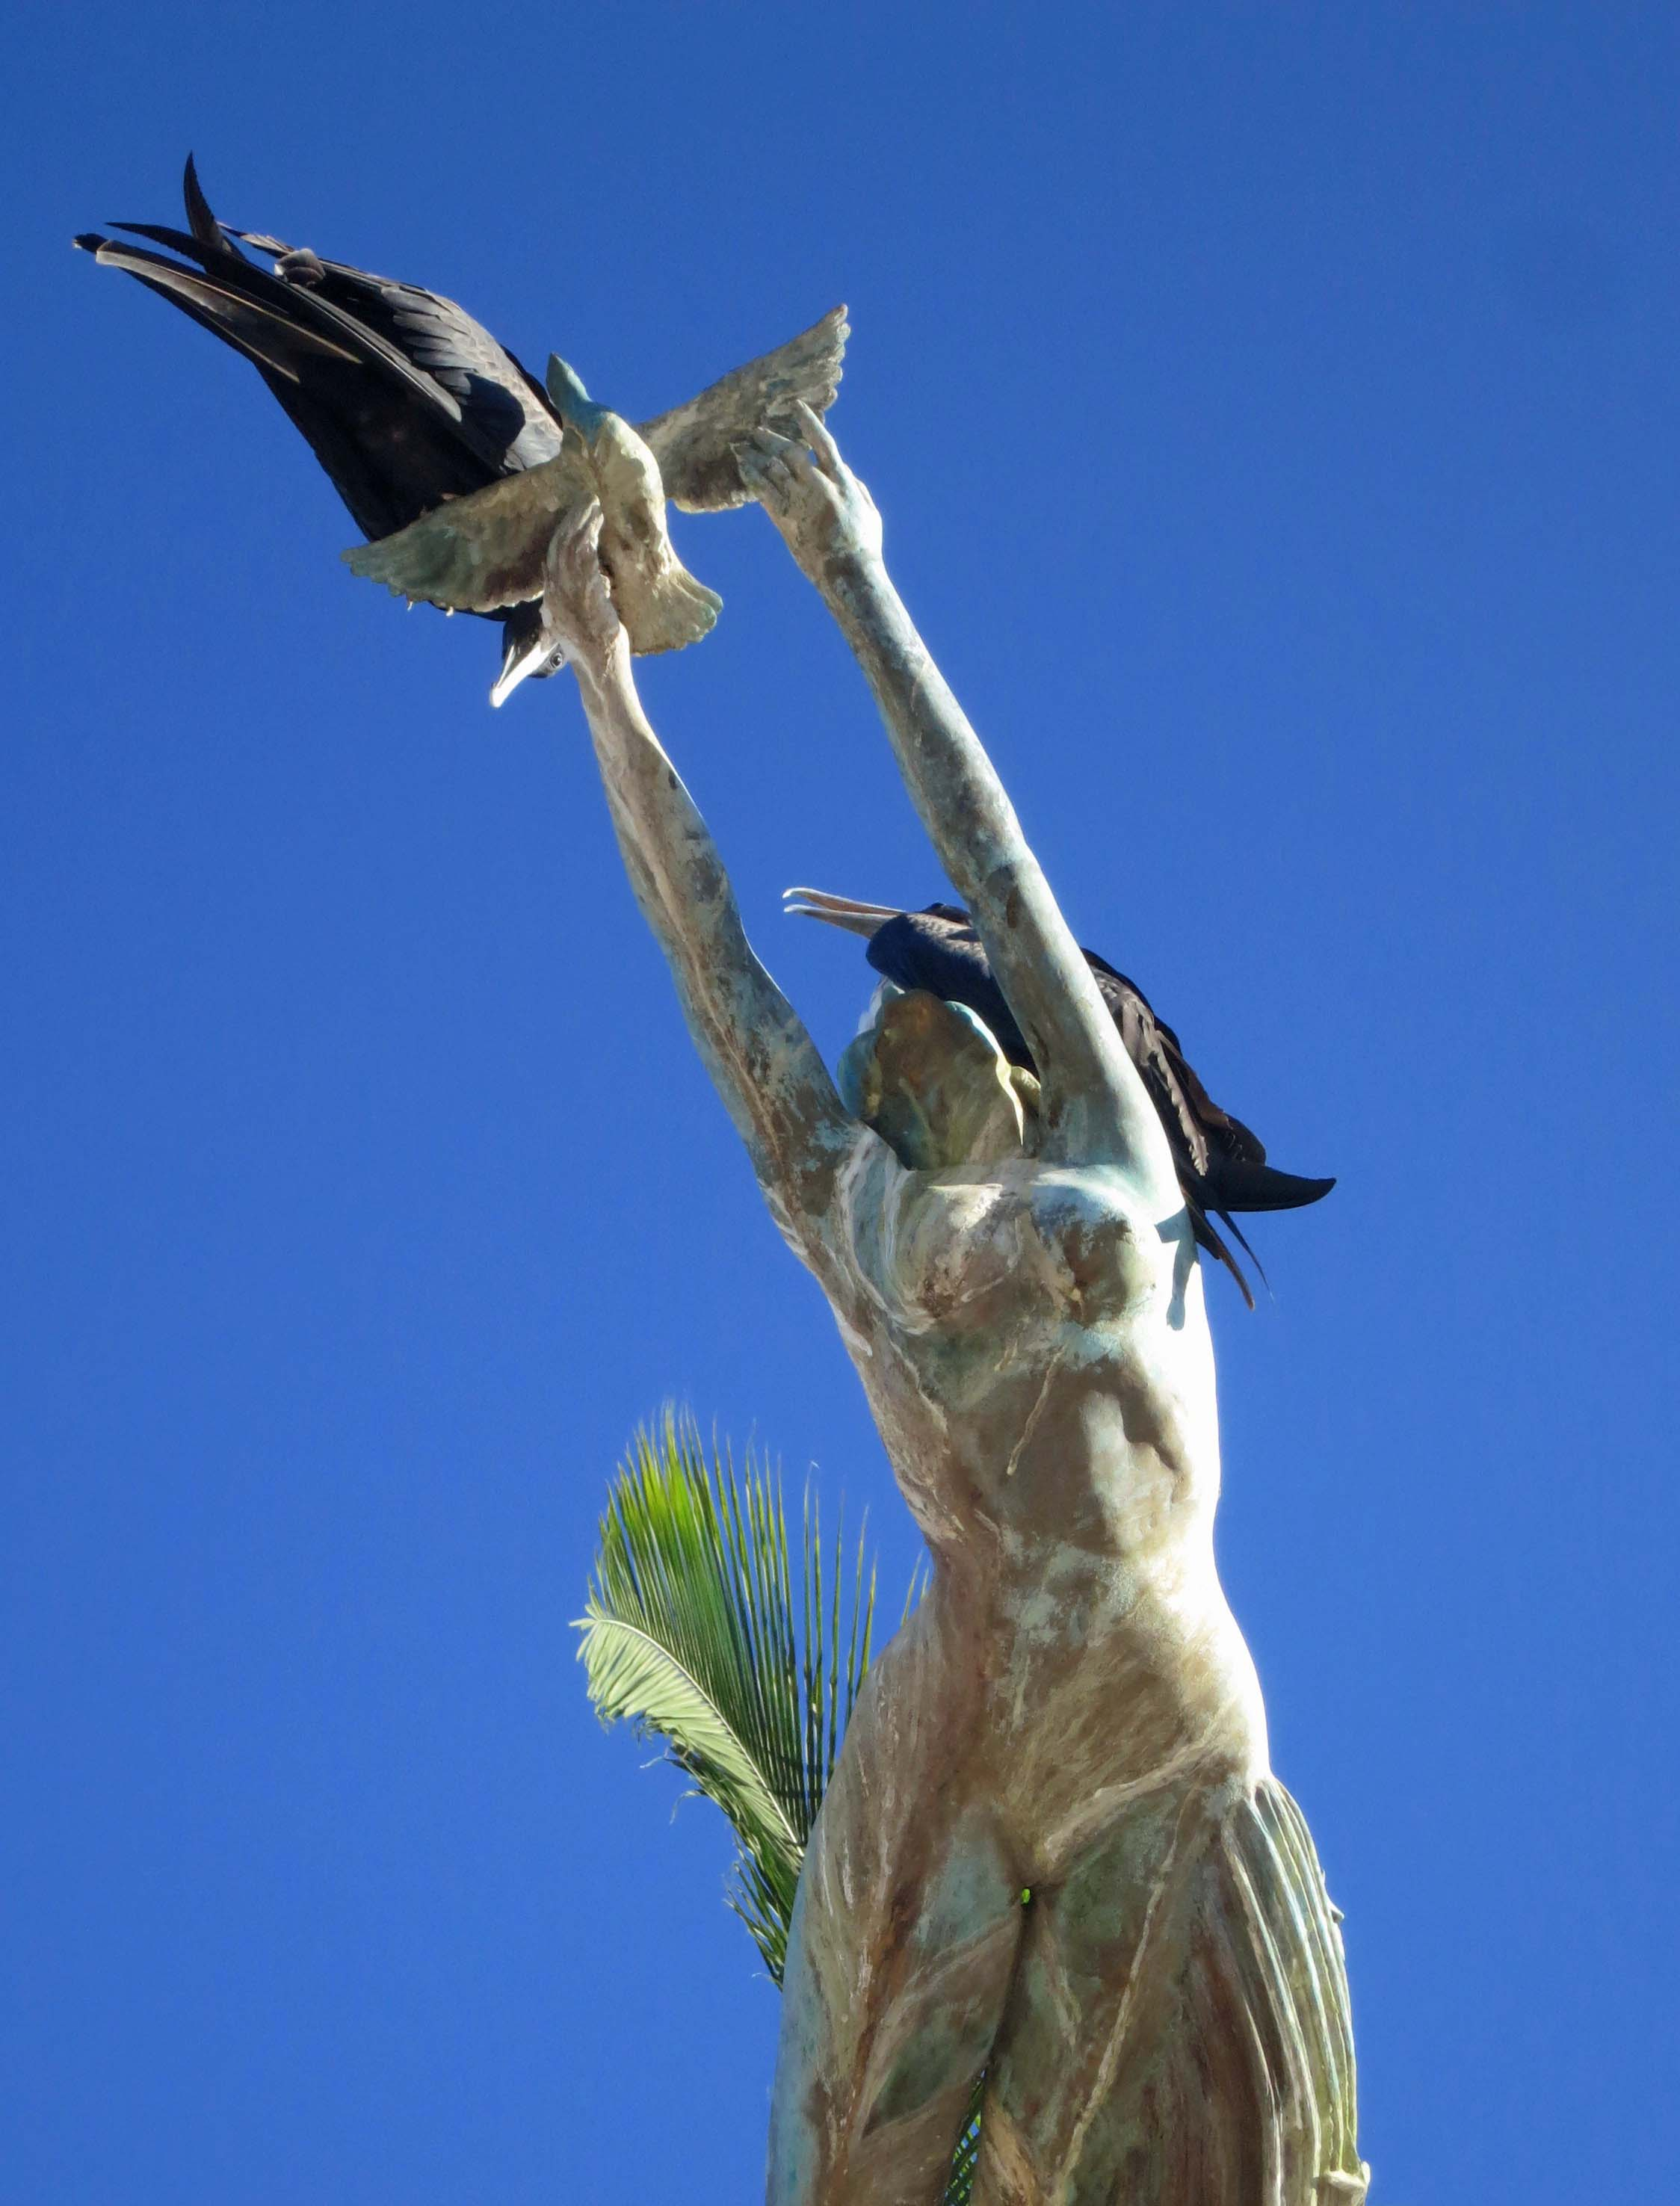 Photograph of Puerto Vallarta's Millennia Statue by Curtis Mekemson.